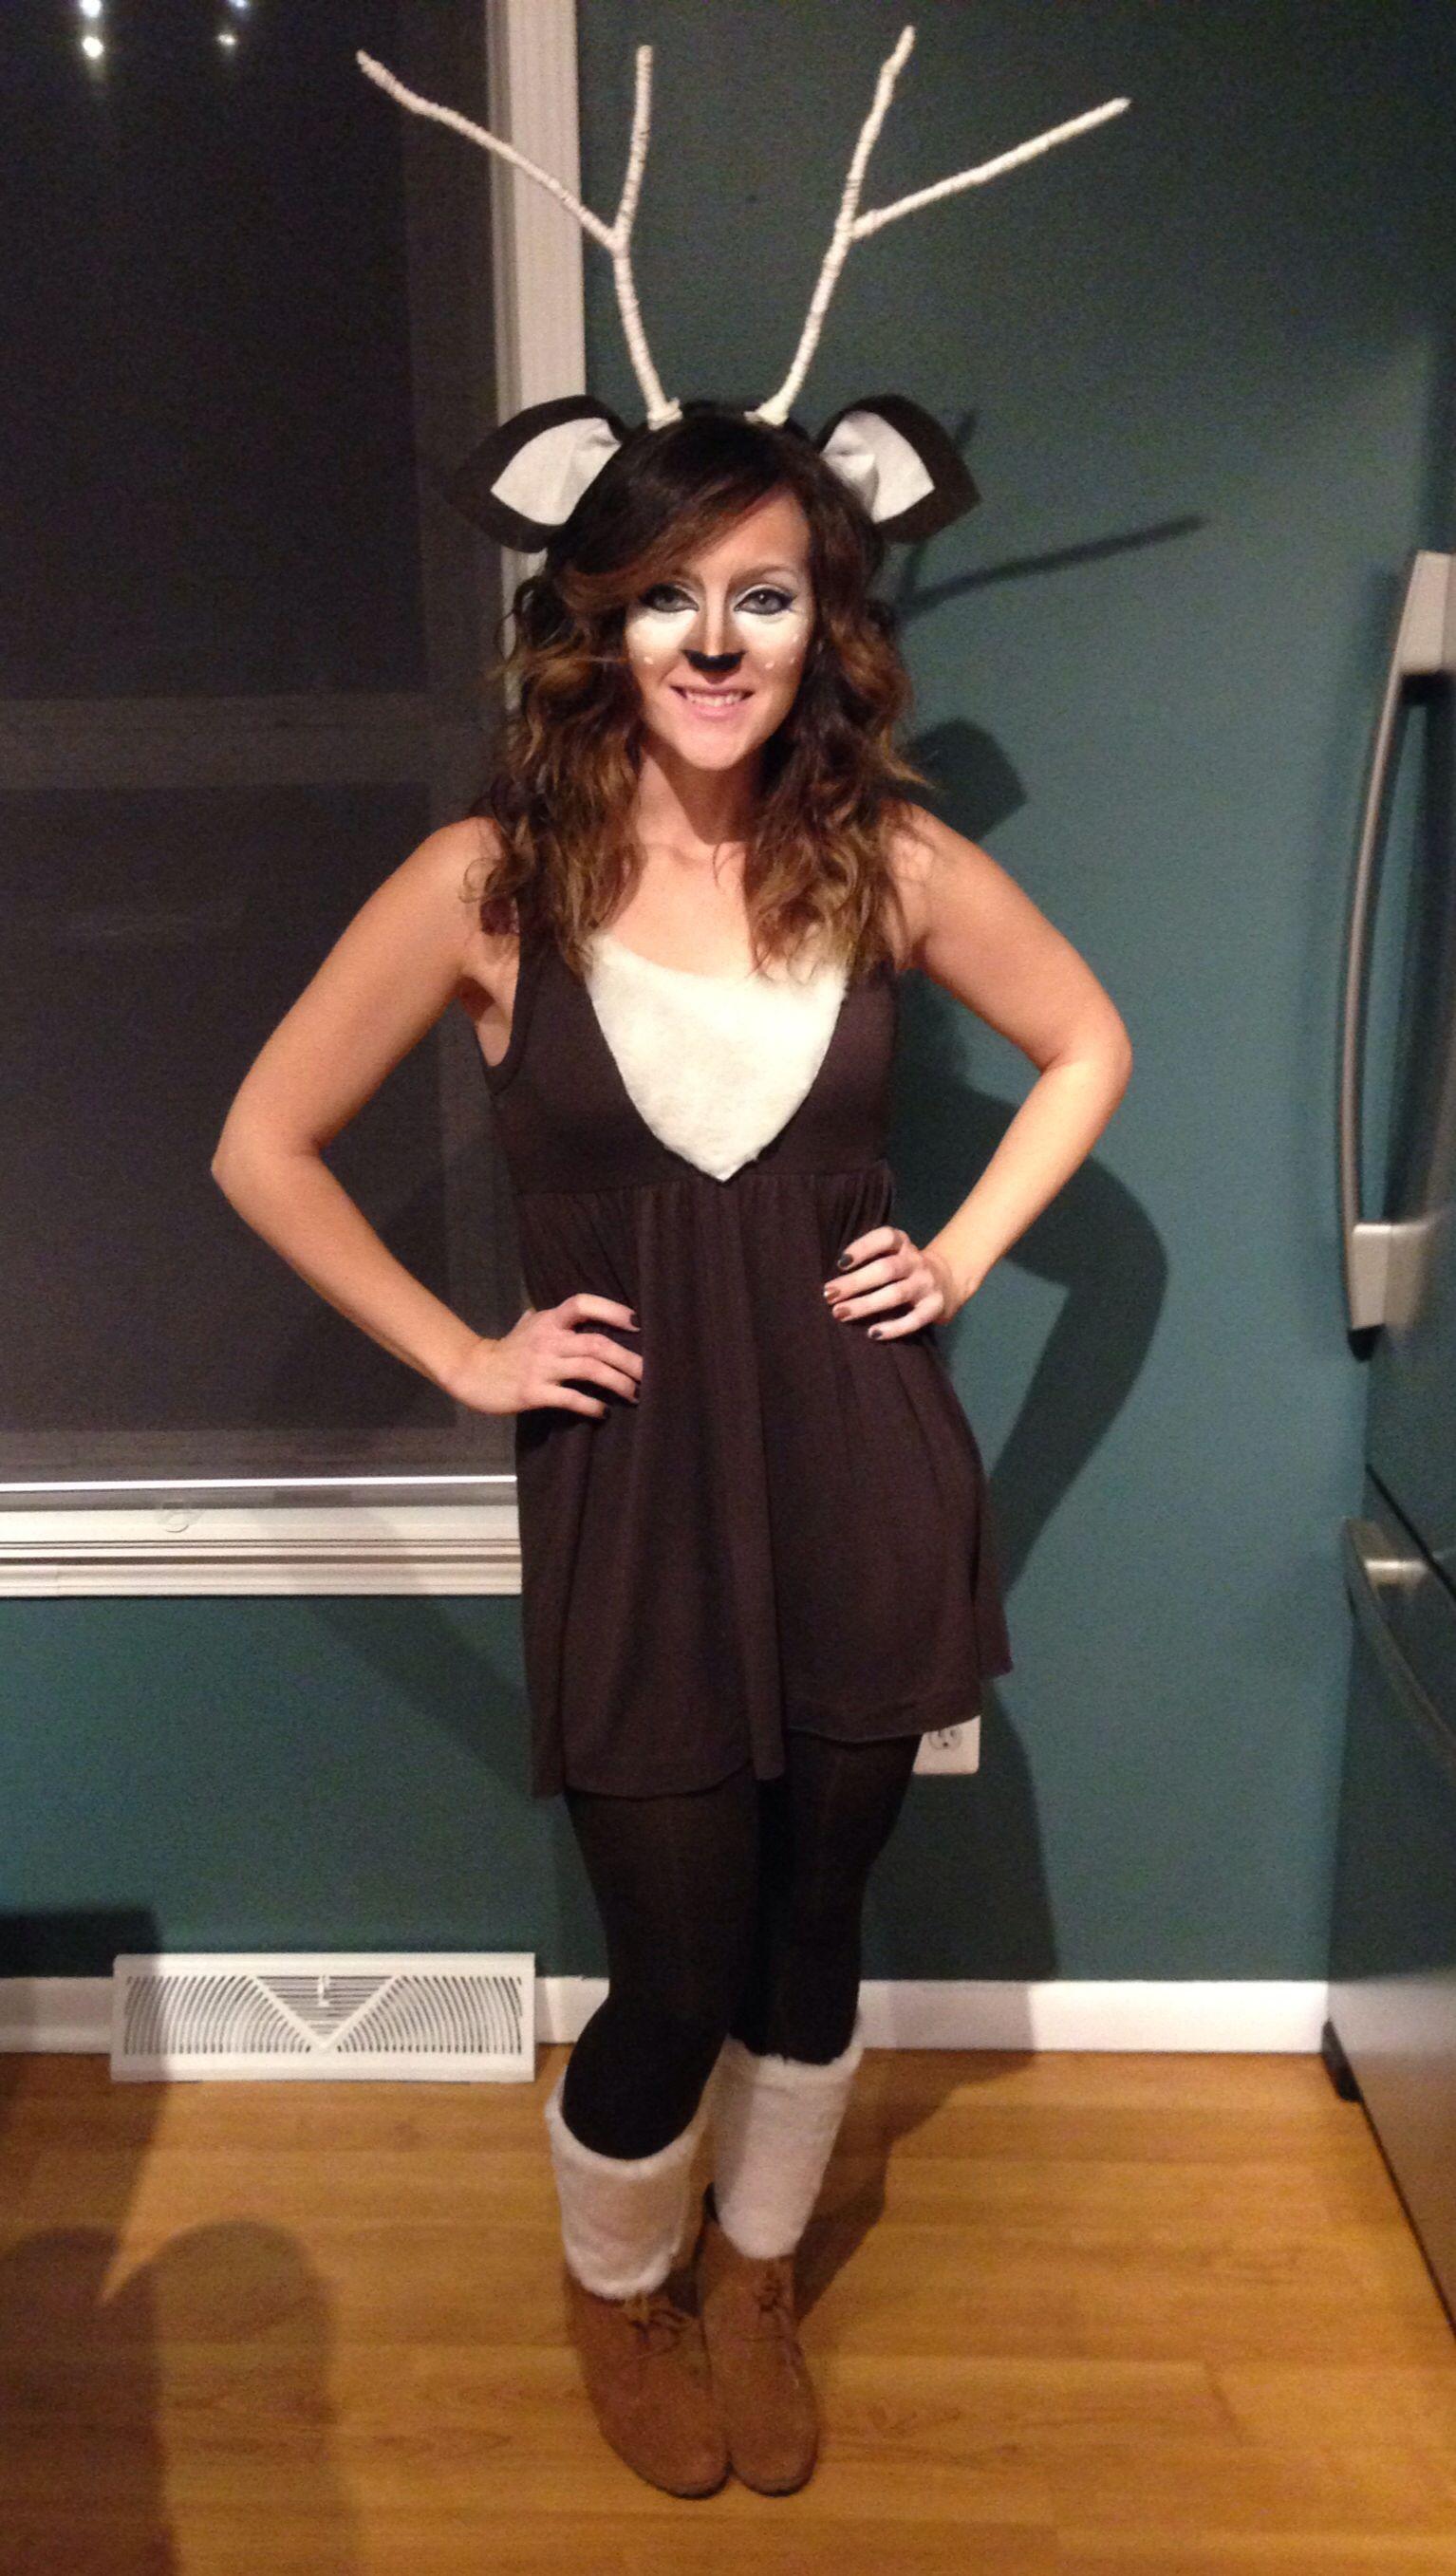 Pin By Gina Iannarelli On Art Deer Halloween Costumes Halloween Costumes Classy Halloween Costumes